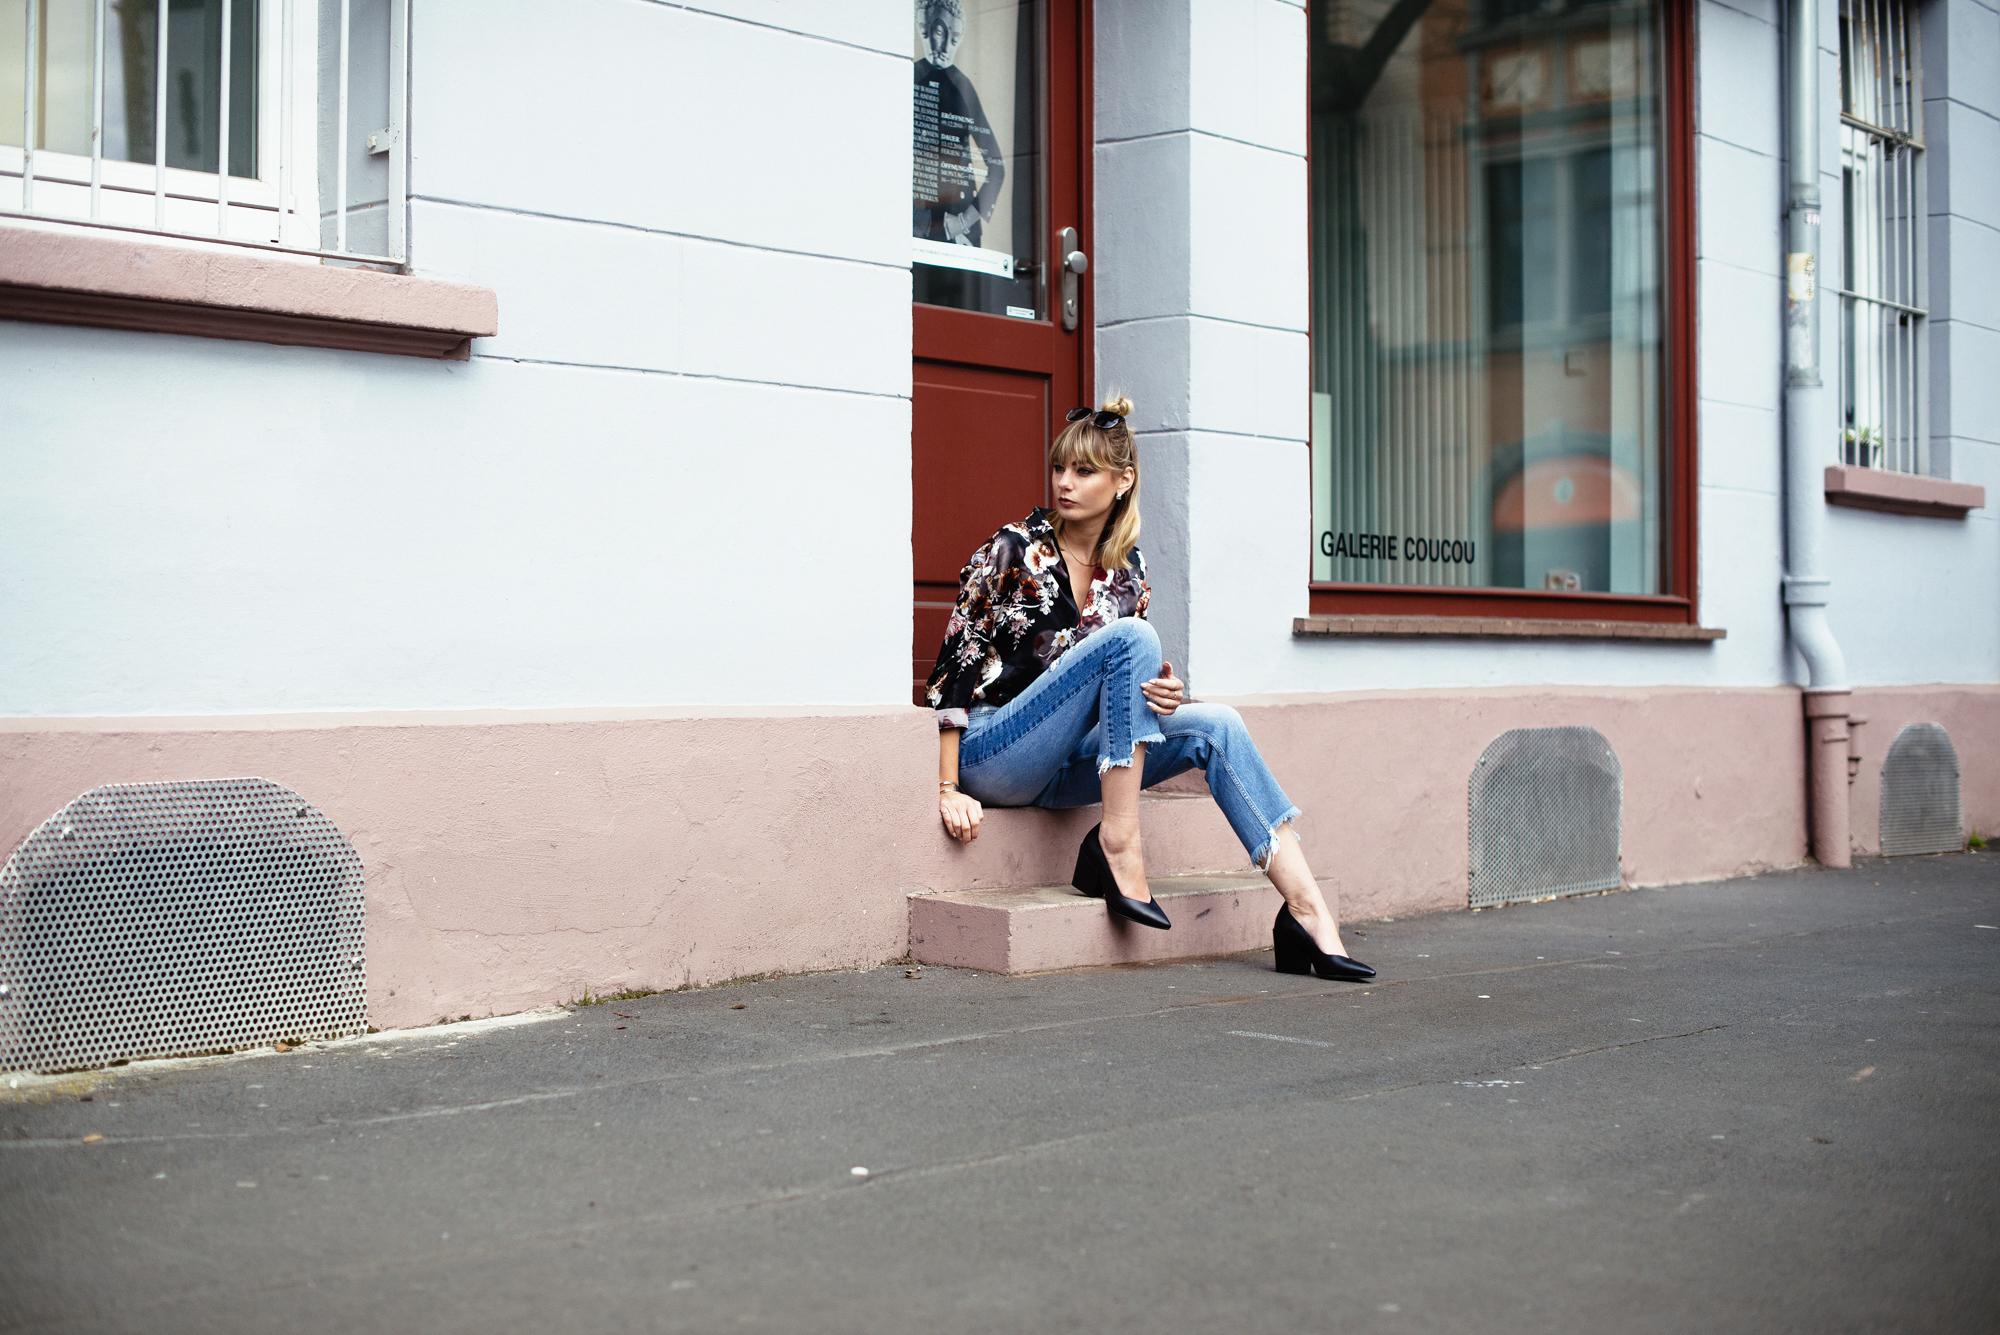 Blumenmuster_Trend_Kombinieren_Hna7_HnaSieben_Kiamisu_Modeblog_Fashionblog_final3_